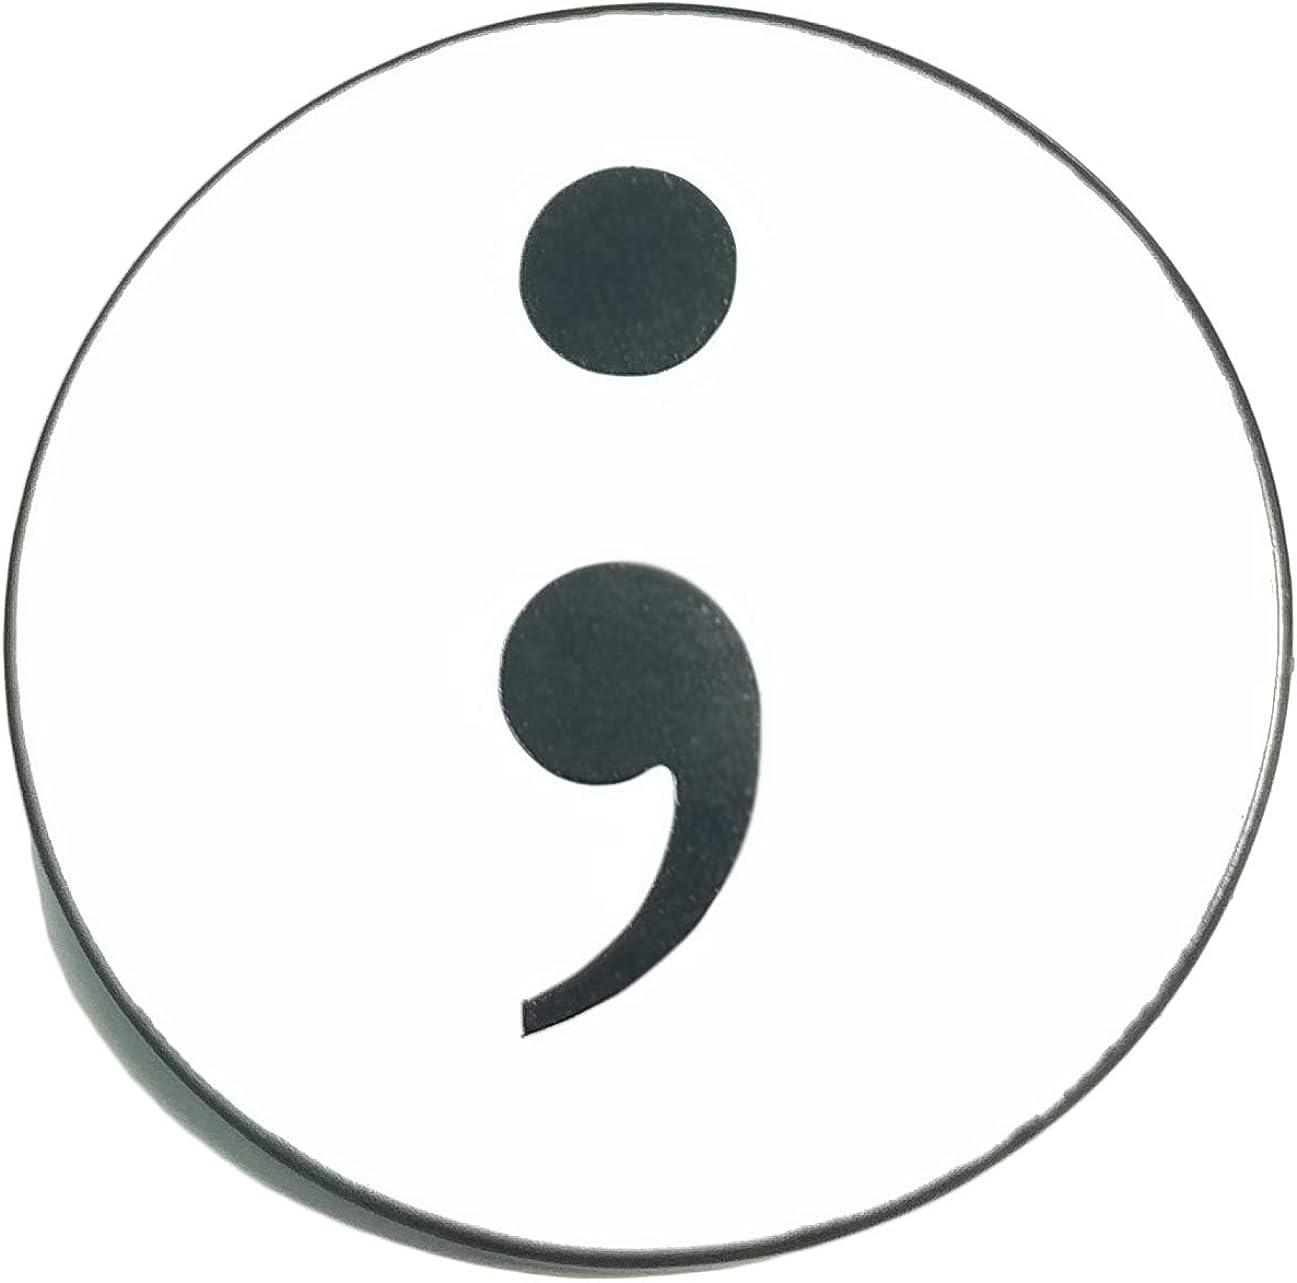 Applicable Pun Semicolon Symbol of Hope Enamel Pin - Lapel or Fabric Pin (Black)